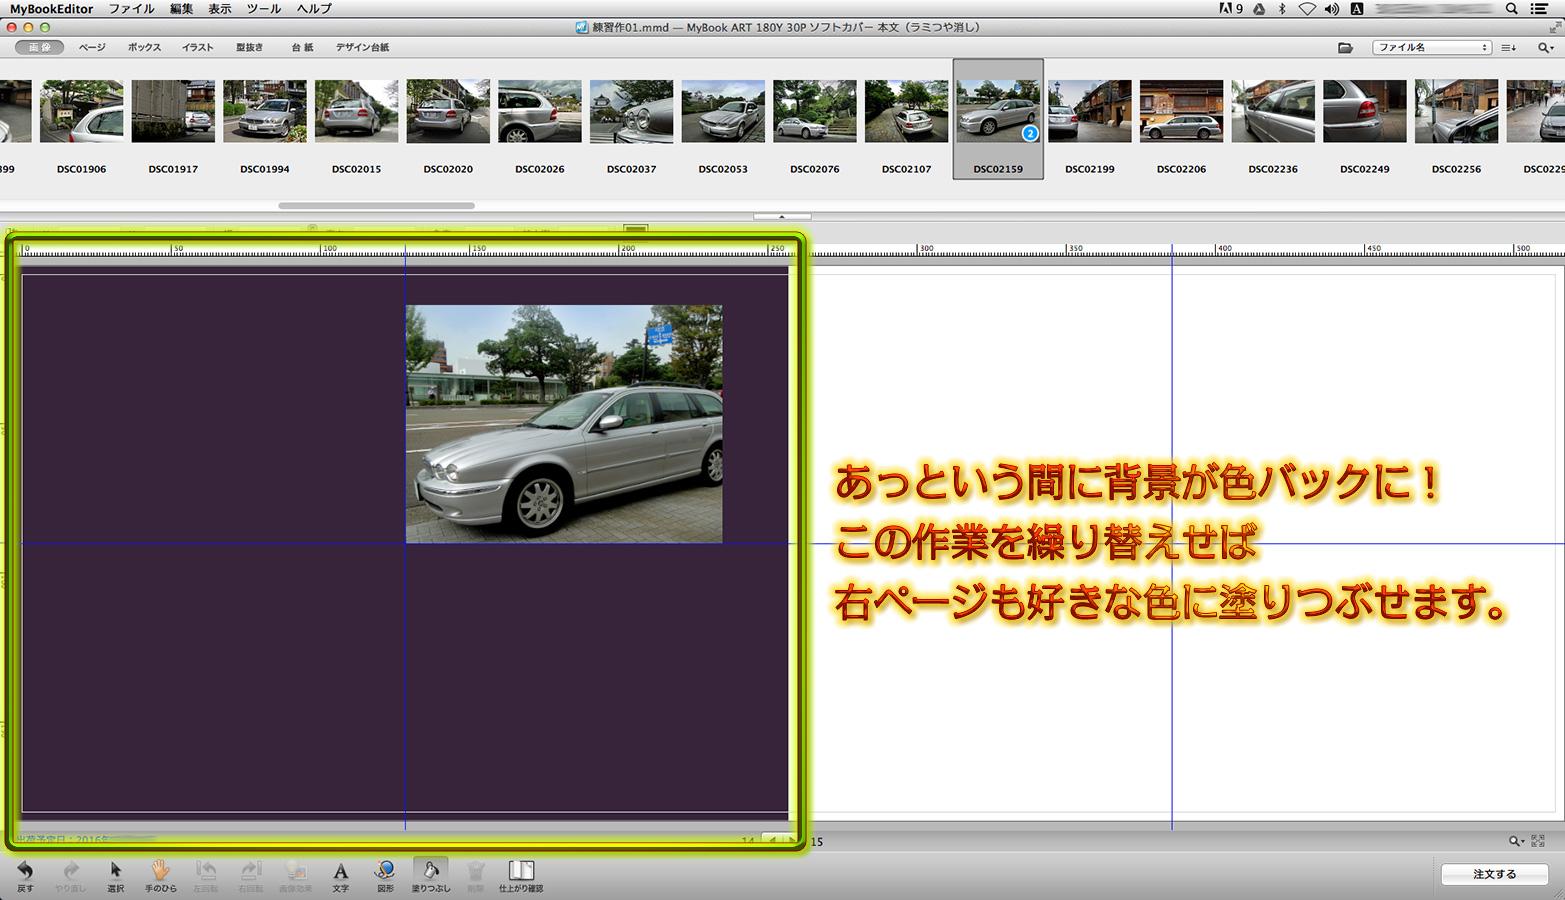 http://moritetsu.info/car/img/mb059-2016-03-02-18-45-11.jpg